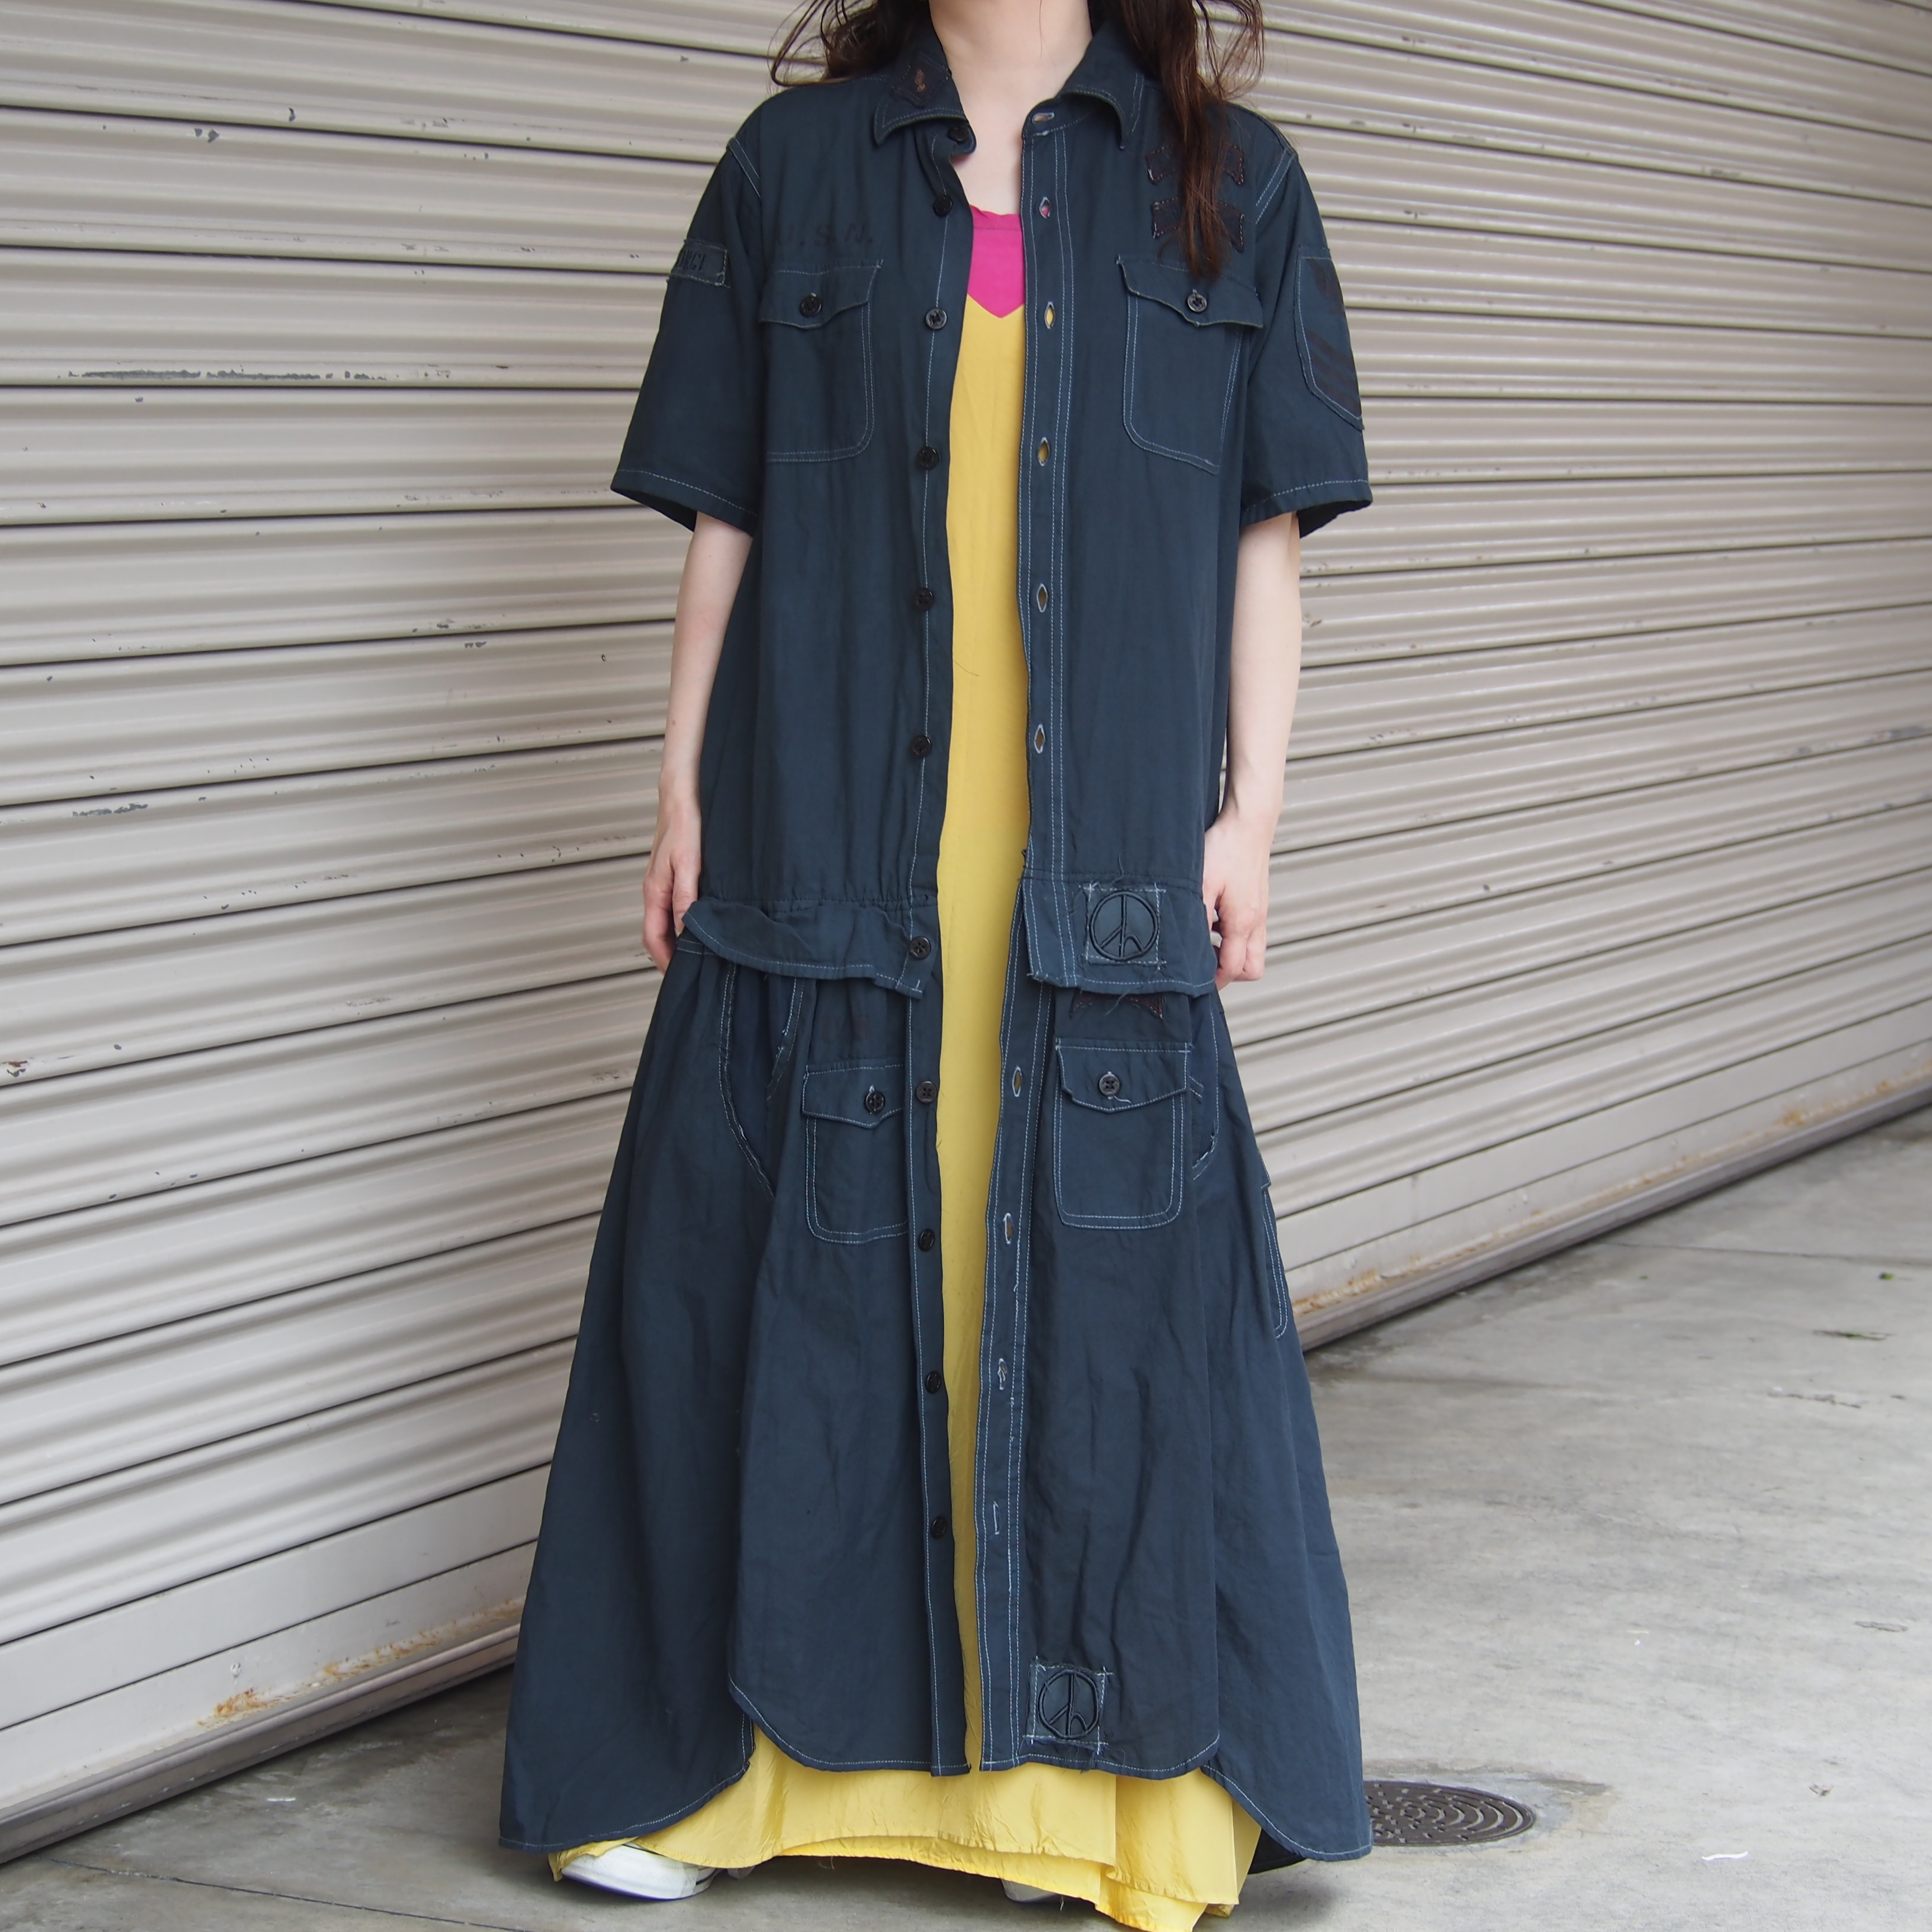 【sandglass】Dark Knight shirt custom one piece(B) / 【サンドグラス】ダークナイト シャツ カスタム ワンピース(B)